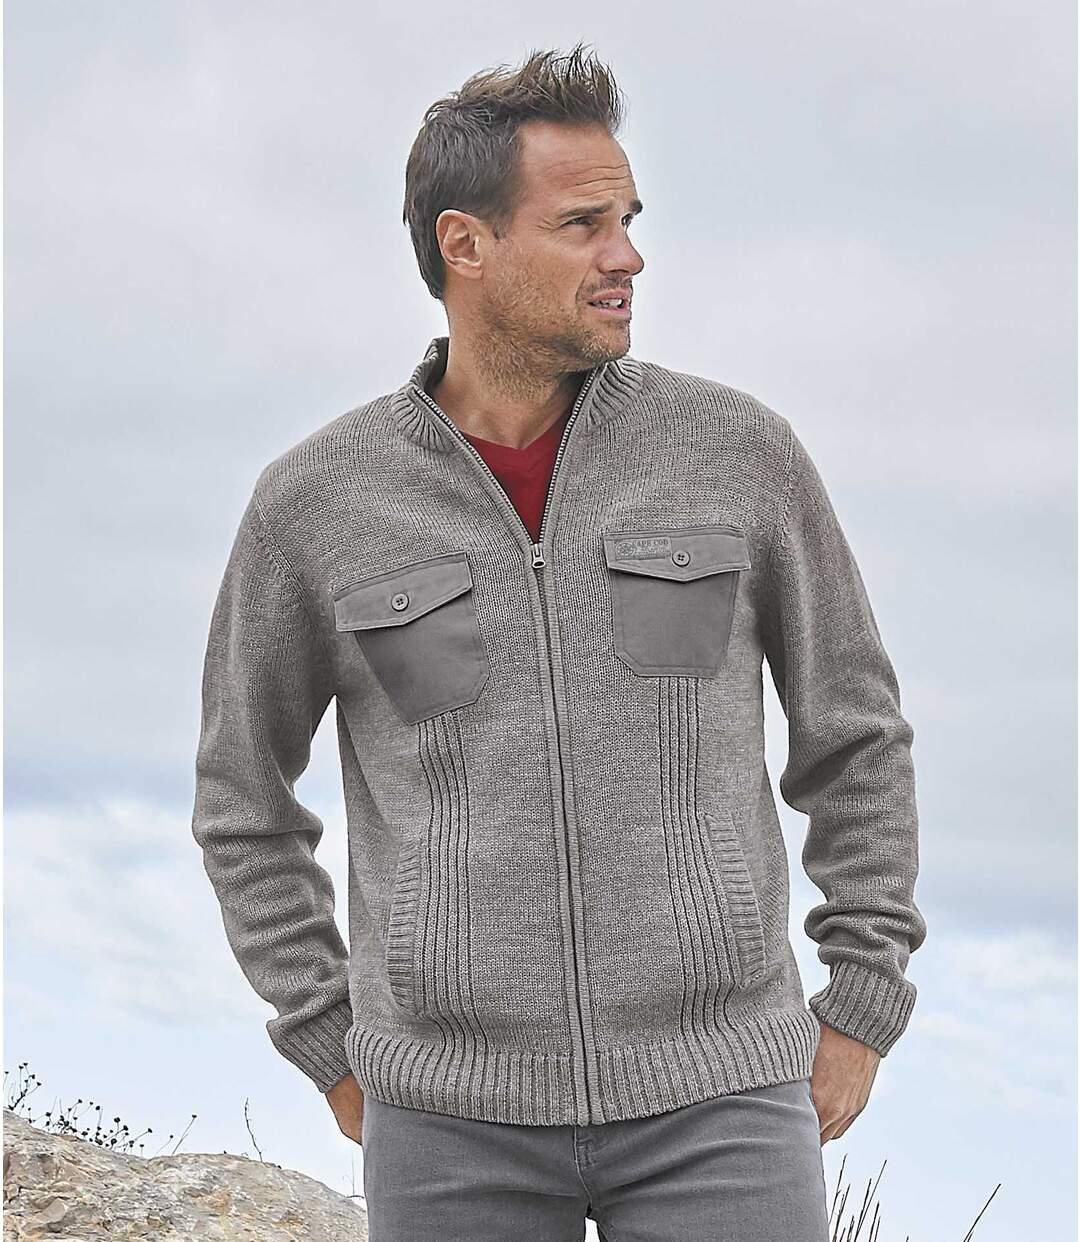 Úpletový sveter na zips Atlas Outdoor